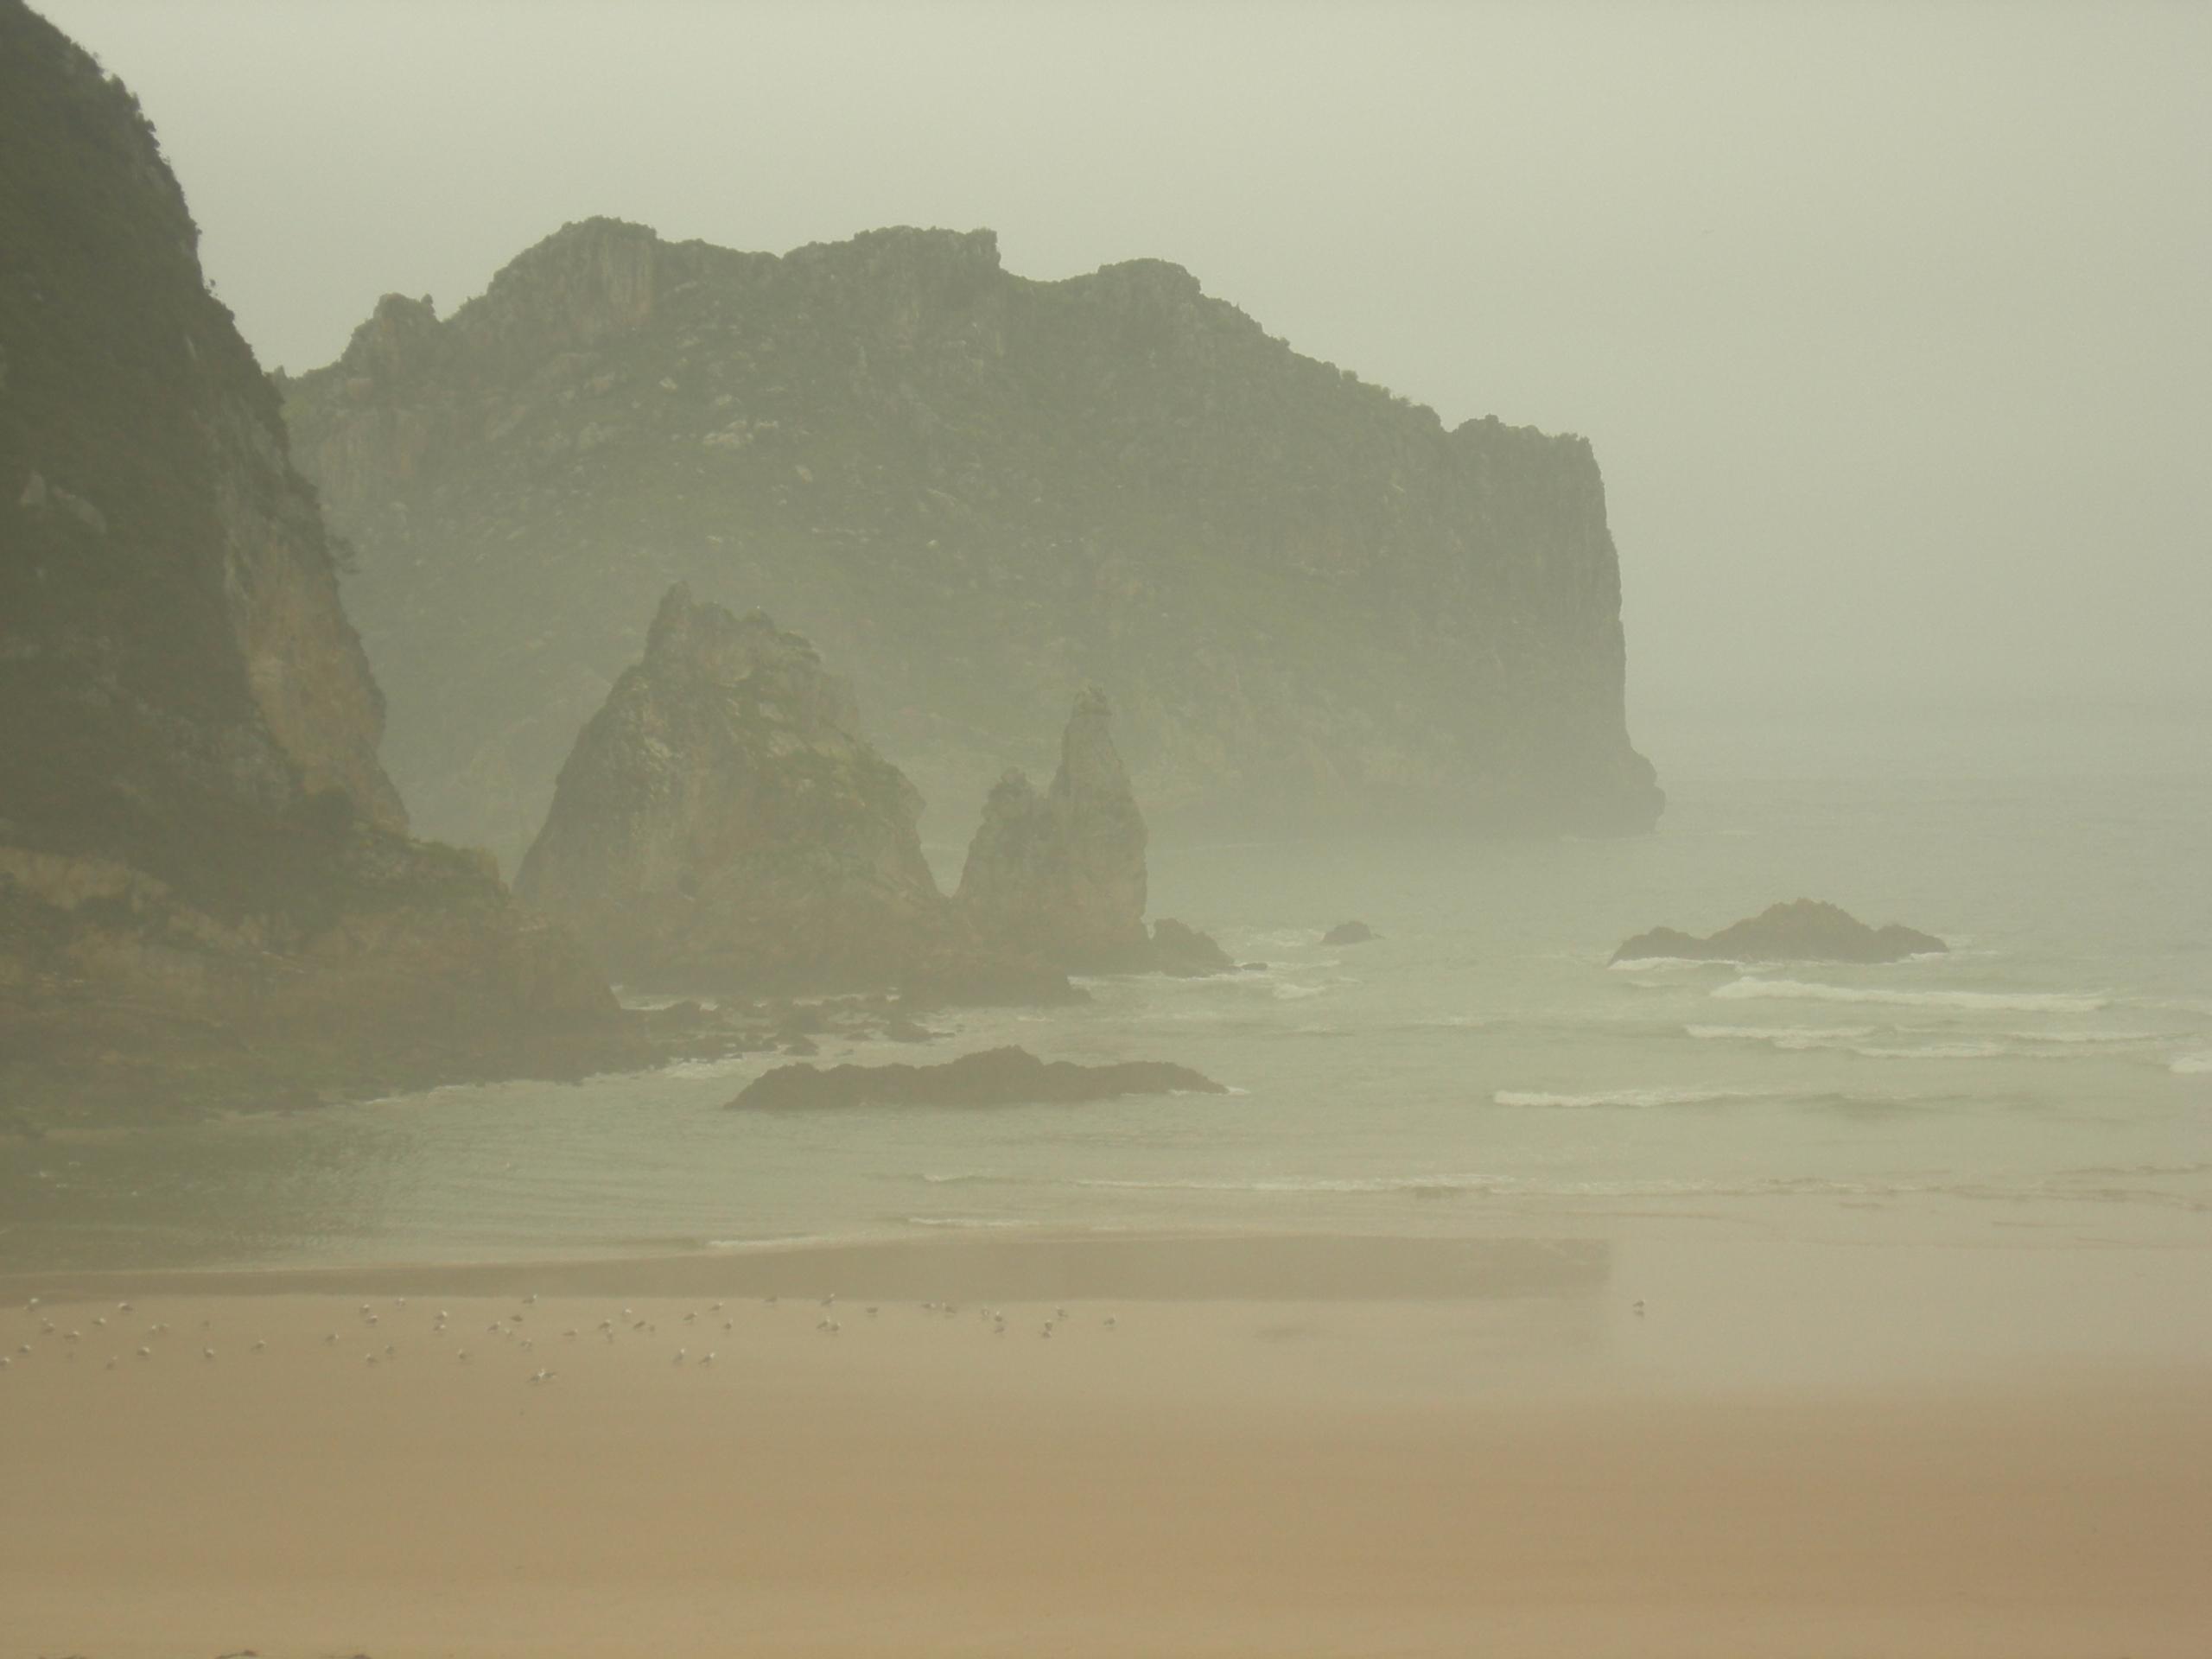 Zumaia, Spain - beach, fog, photography - ivop | ello